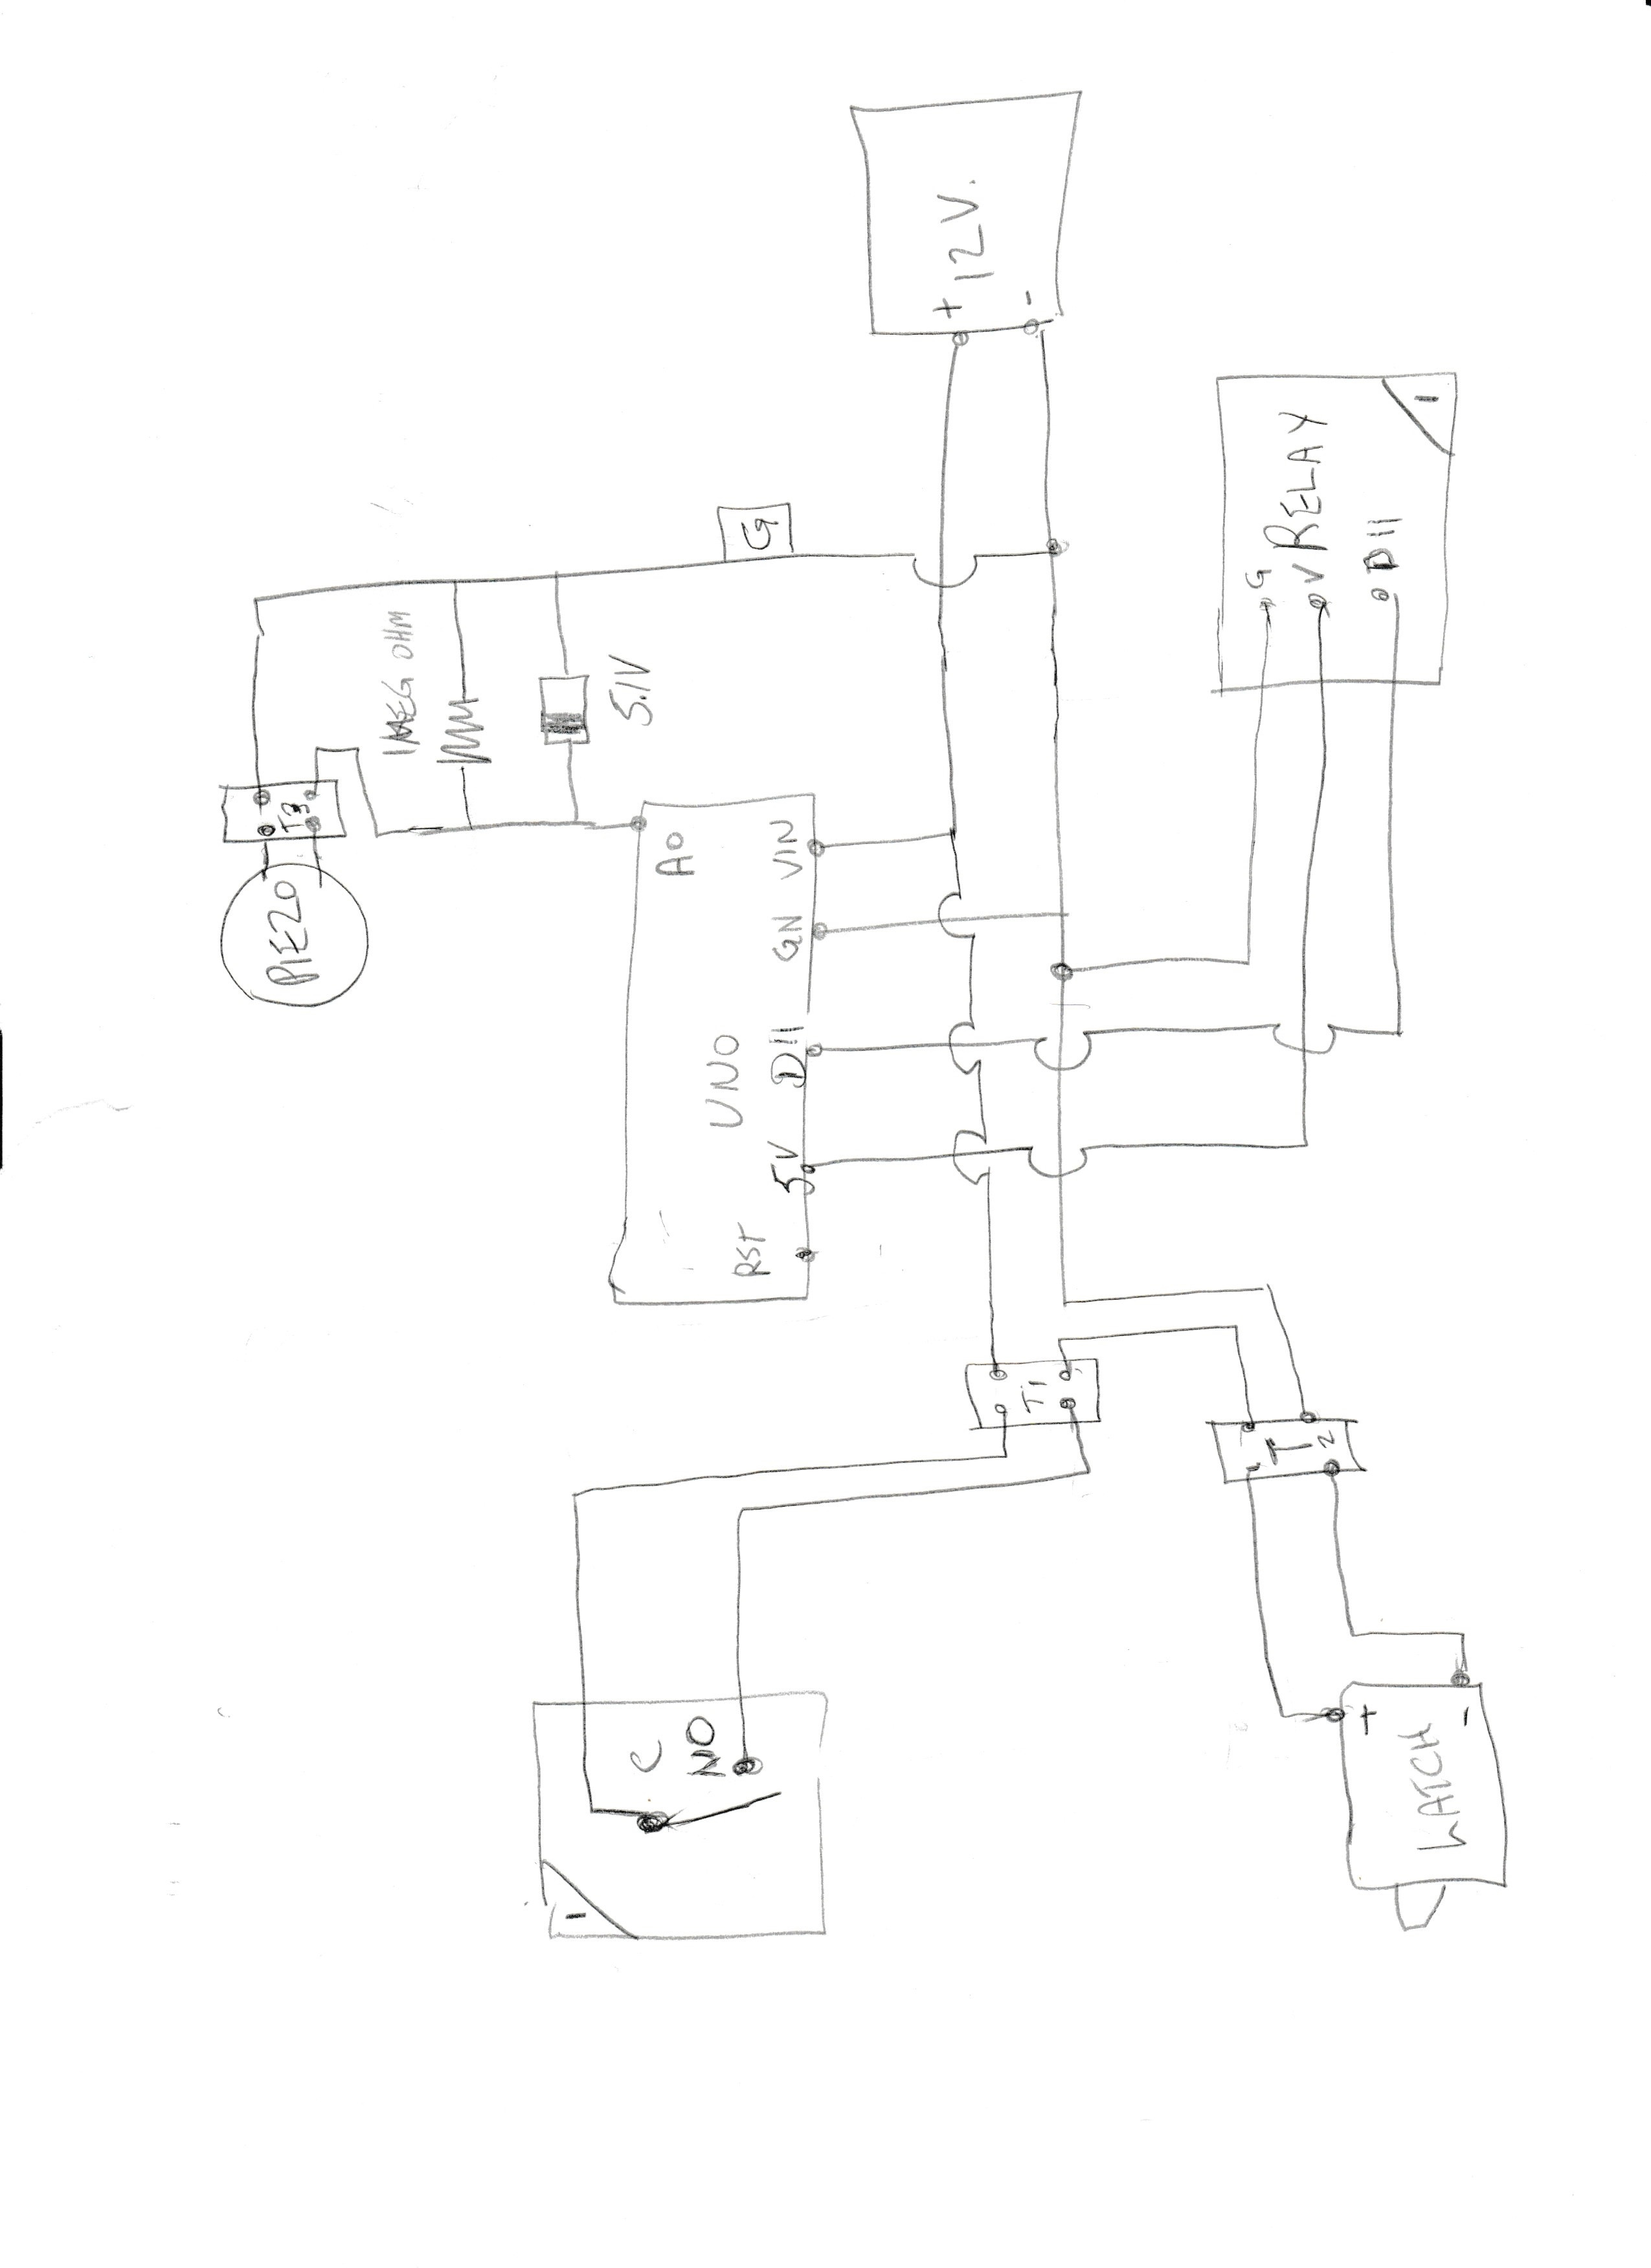 hour meter 12v wiring diagram